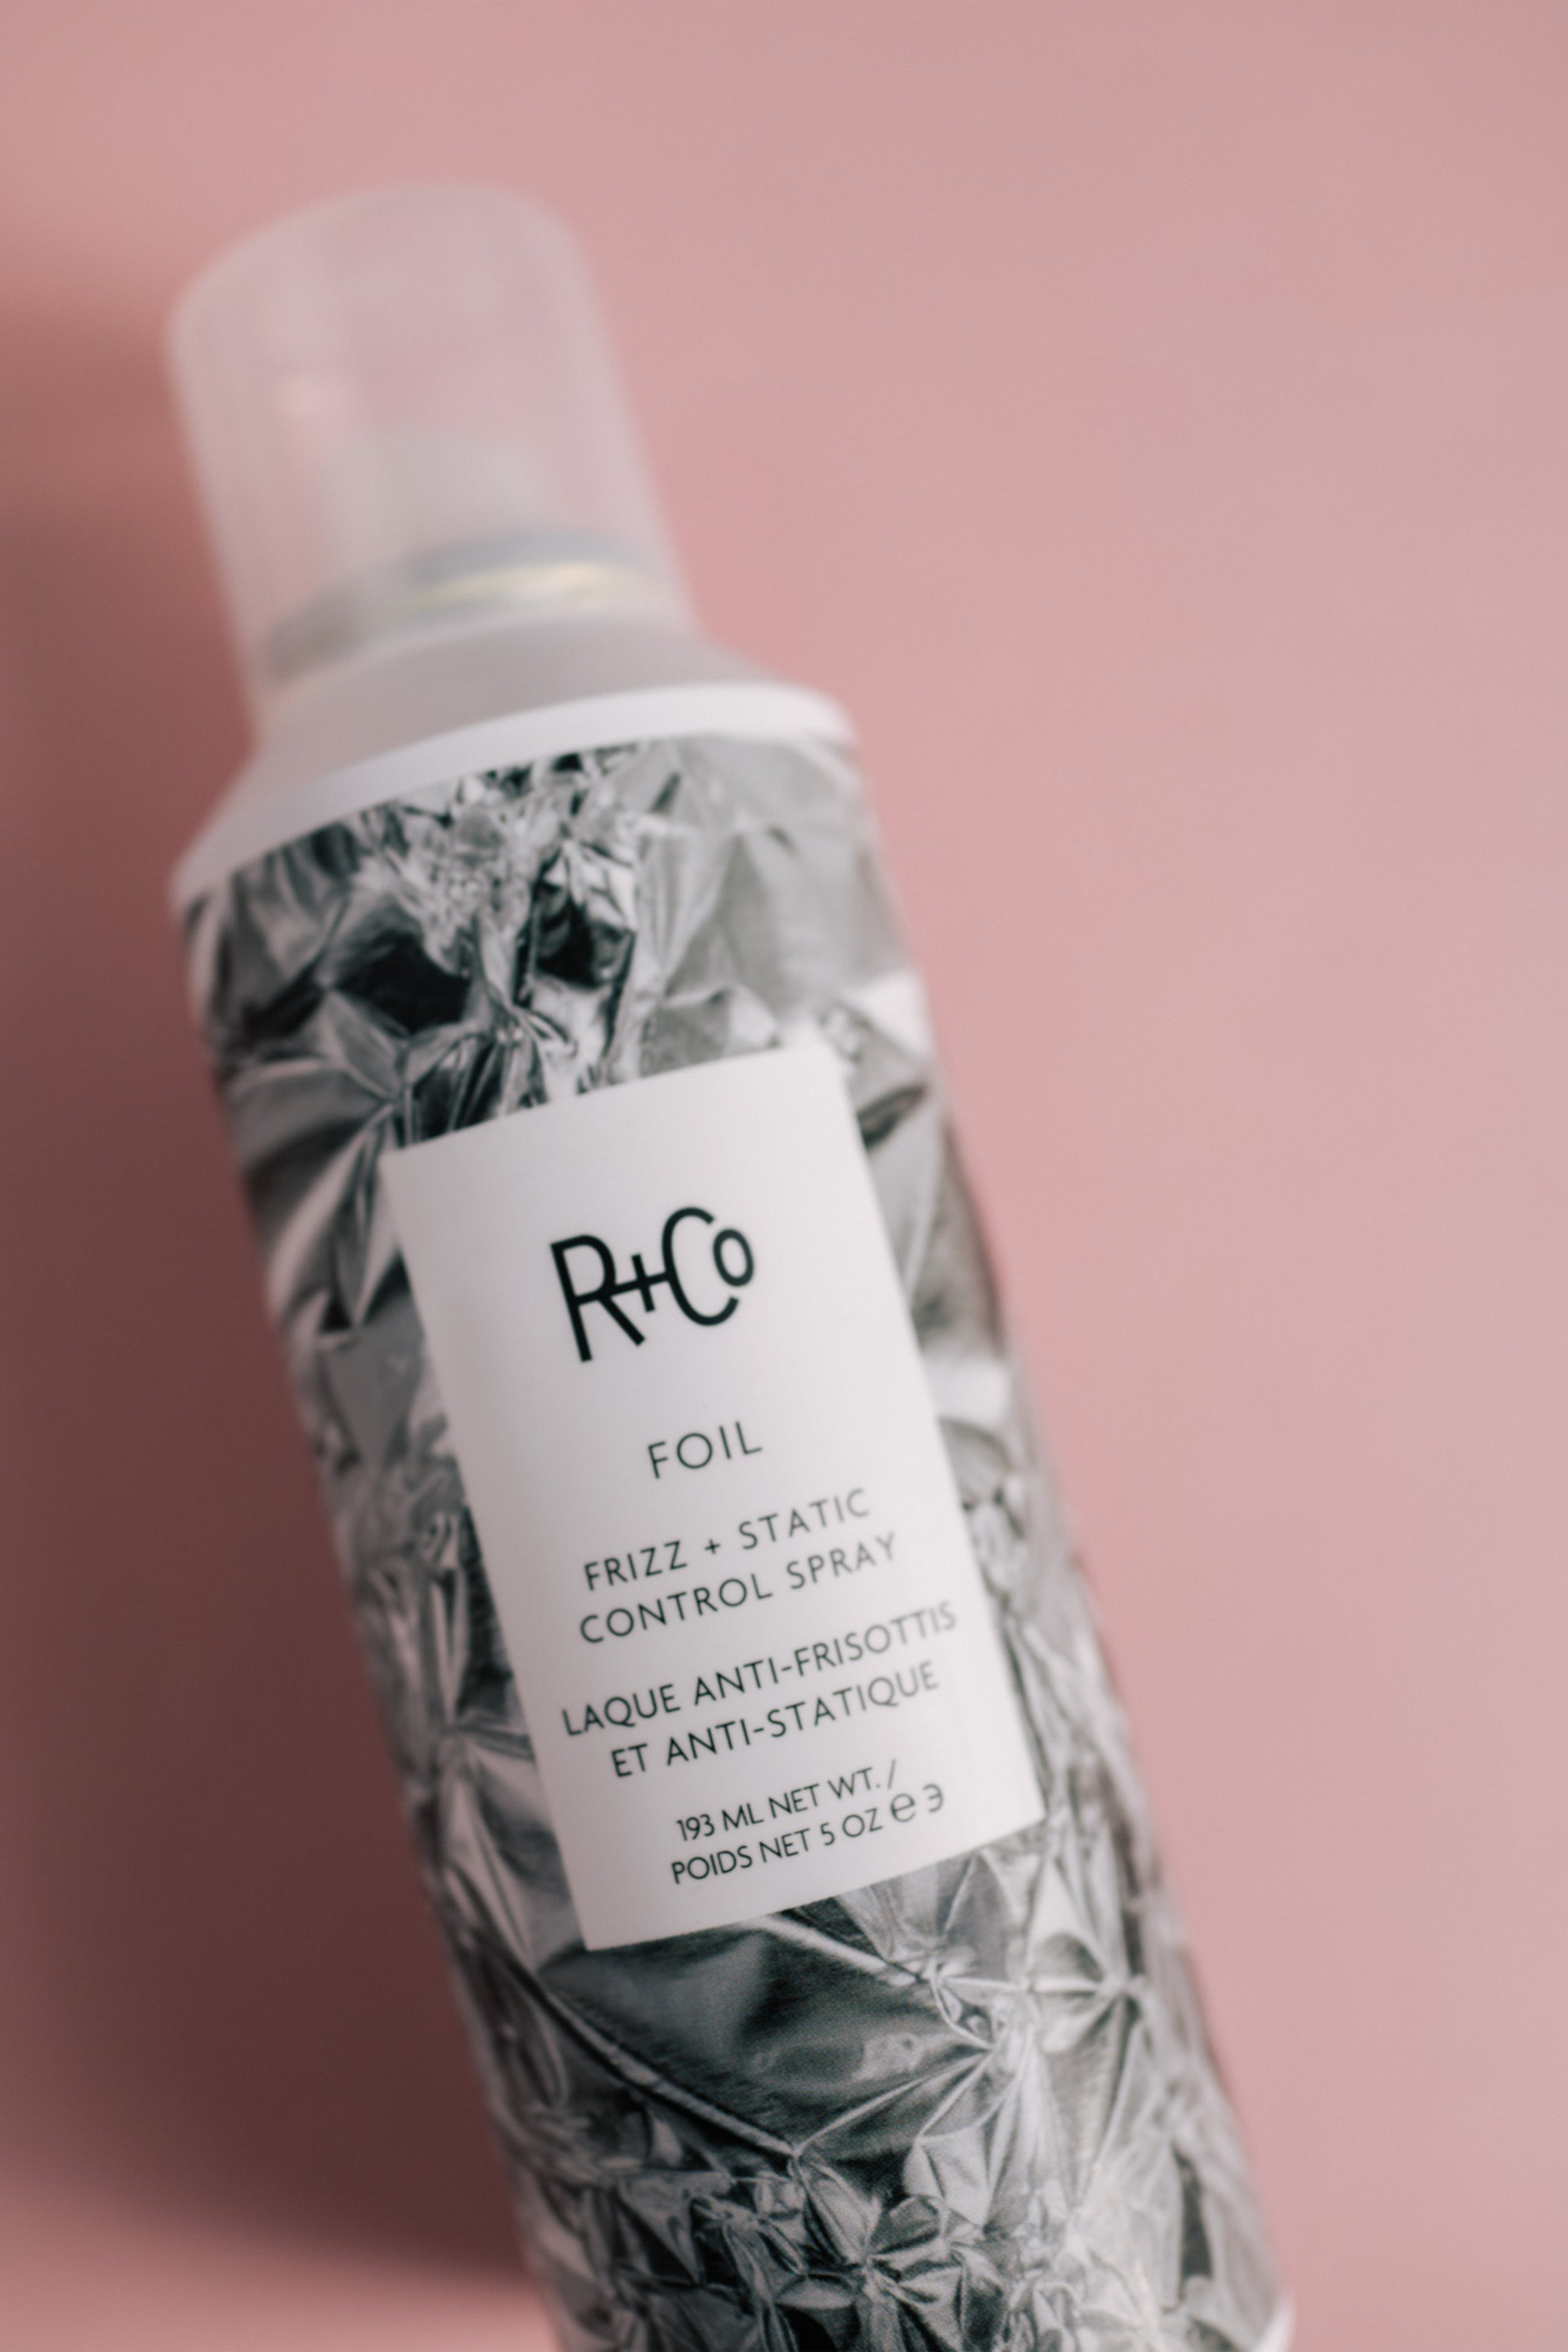 R+Co Hair Product Foil Hair Extensions Treatment Asheville NC